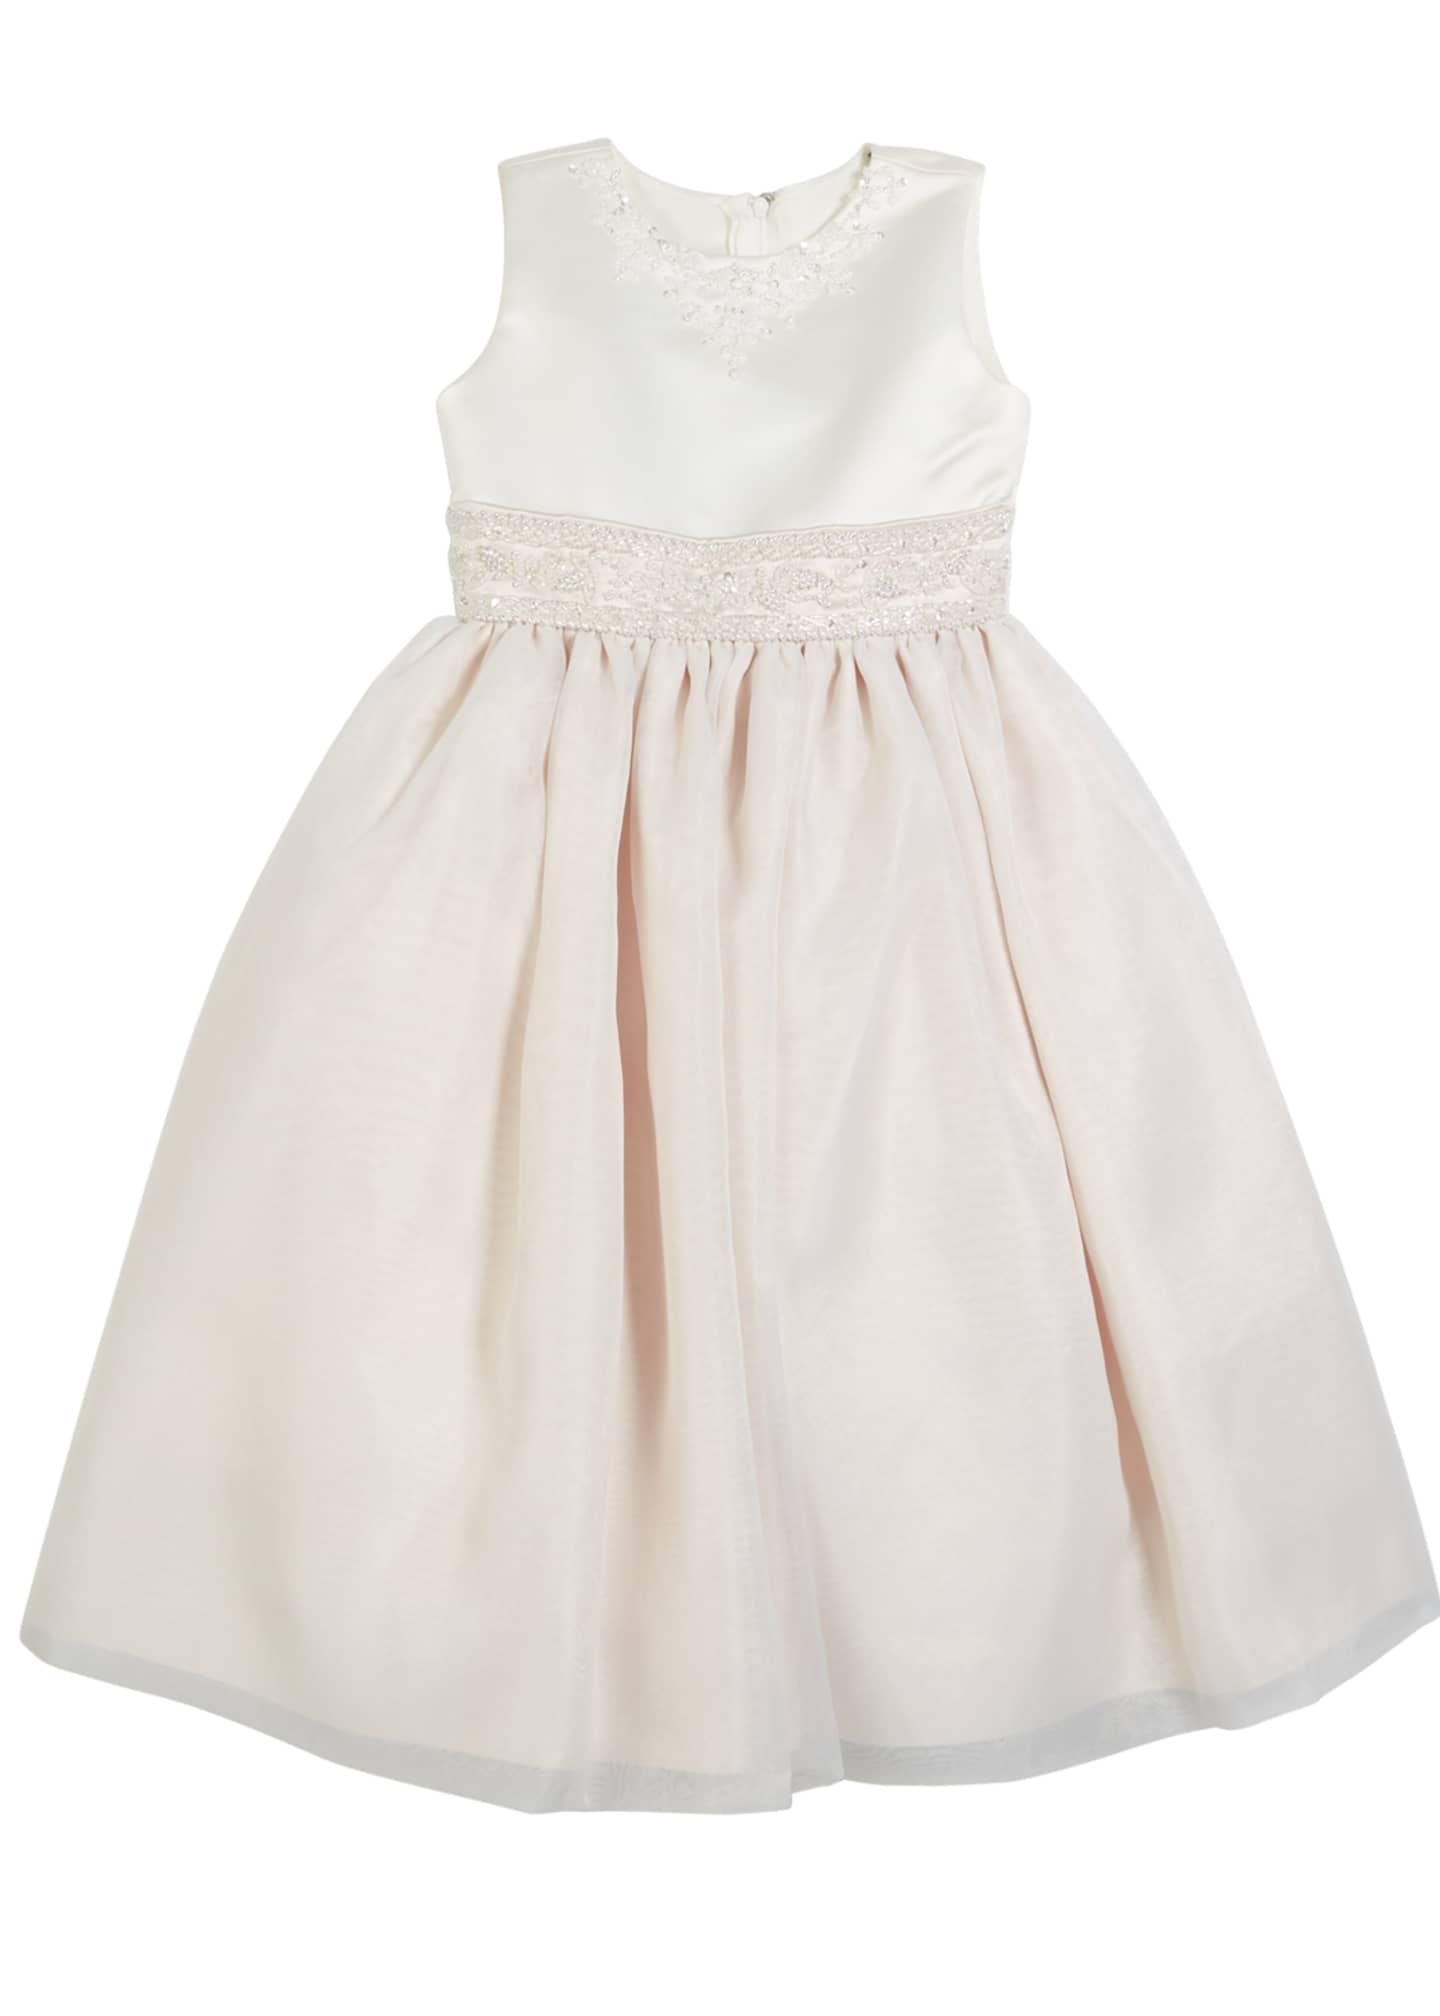 Joan Calabrese Satin & Organza Beaded Dress, Size